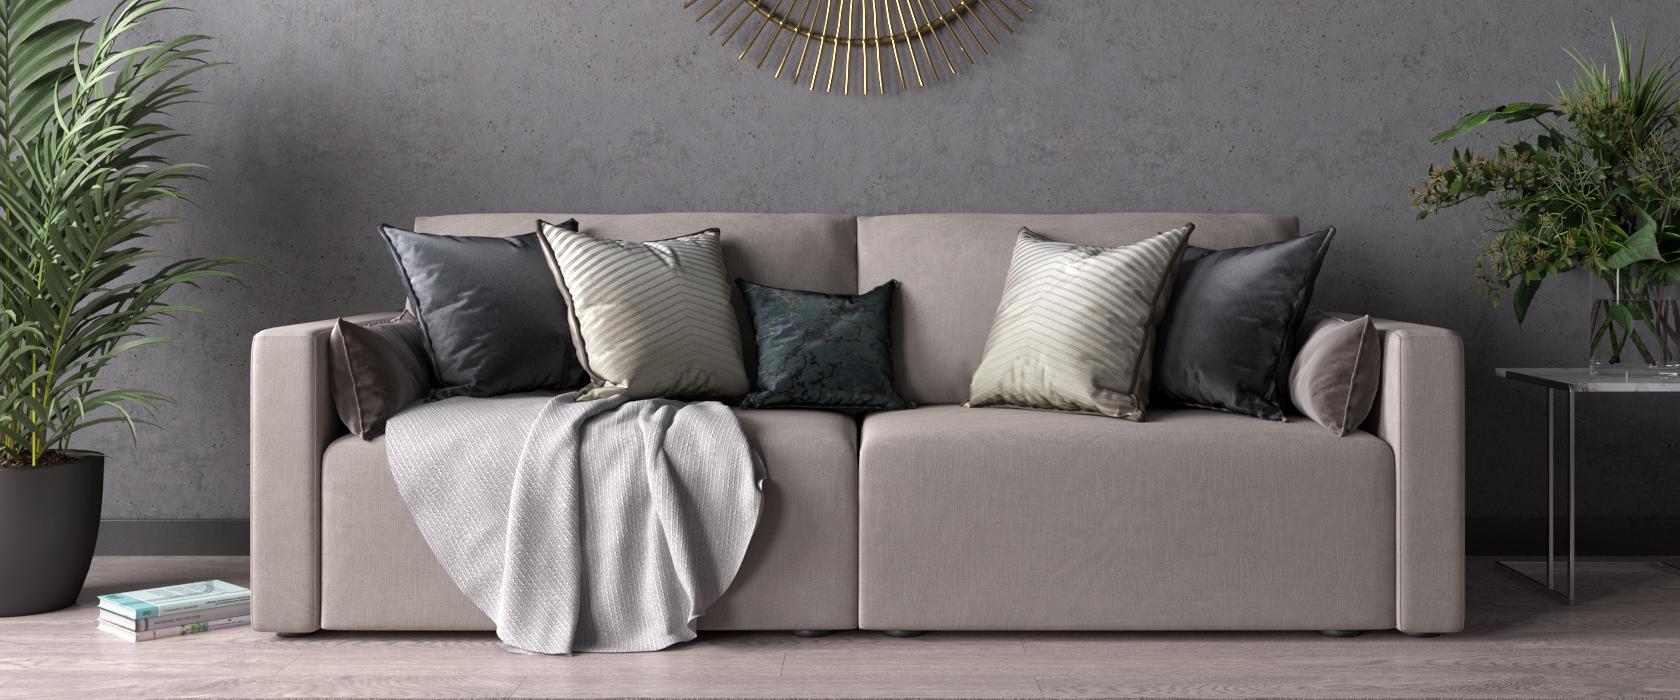 Трехместный диван Greta - Фото 2 - Pufetto